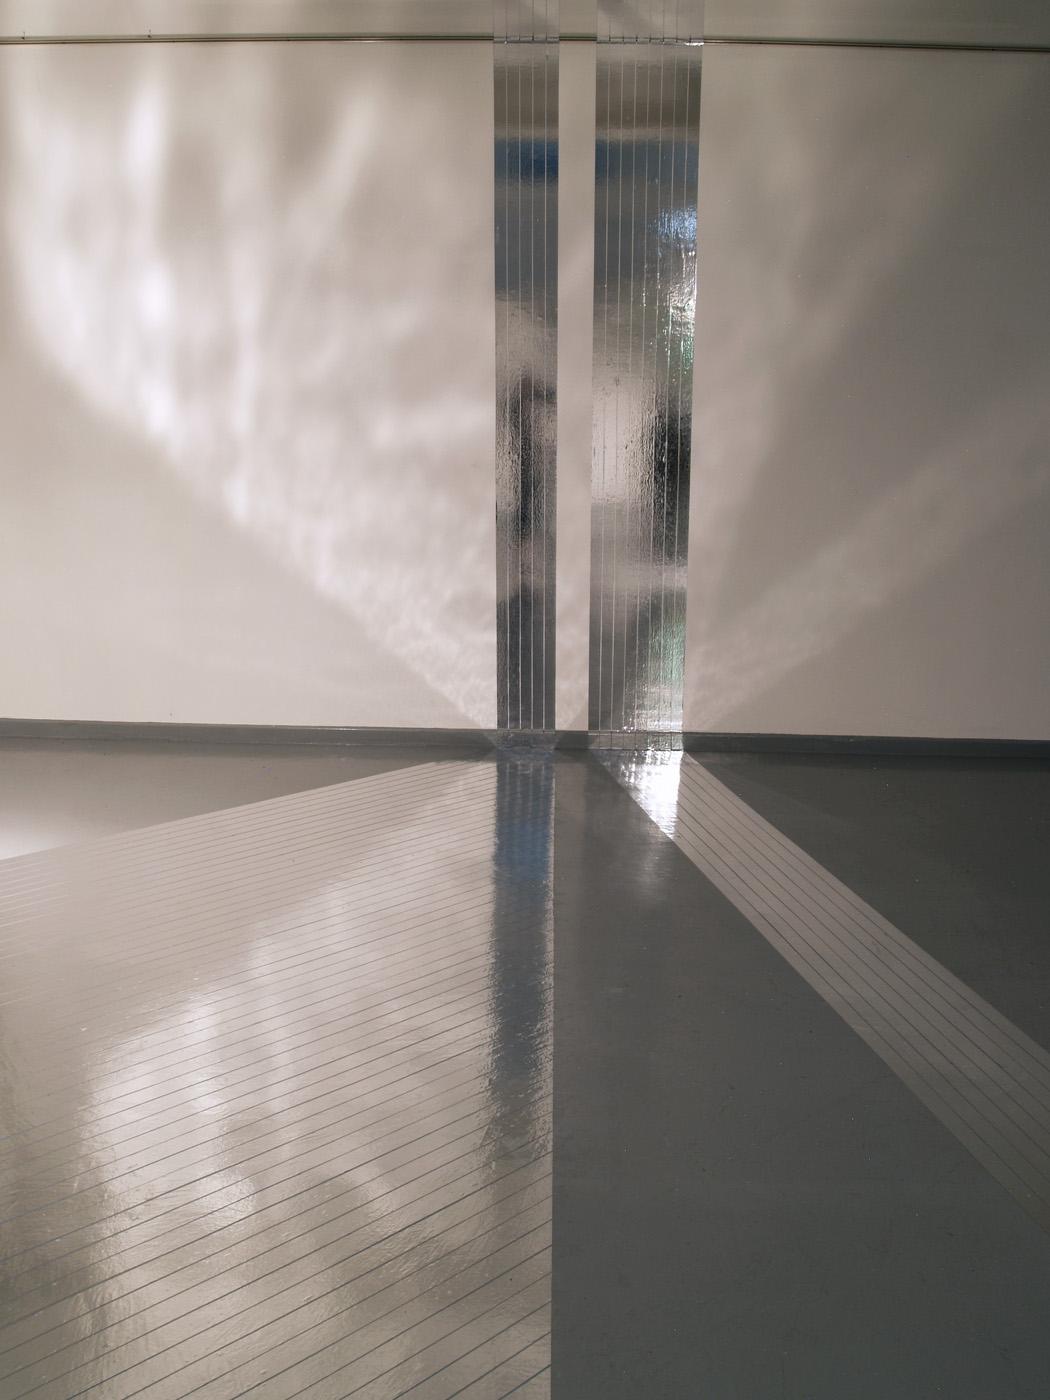 Biljana Jancic,  Spill,  2013 , aluminium tape, masking tape Installation view,  Opposed , The Lock-Up, Newcastle, 2013. Courtesy and copyright the artist. Photograph: Biljana Jancic